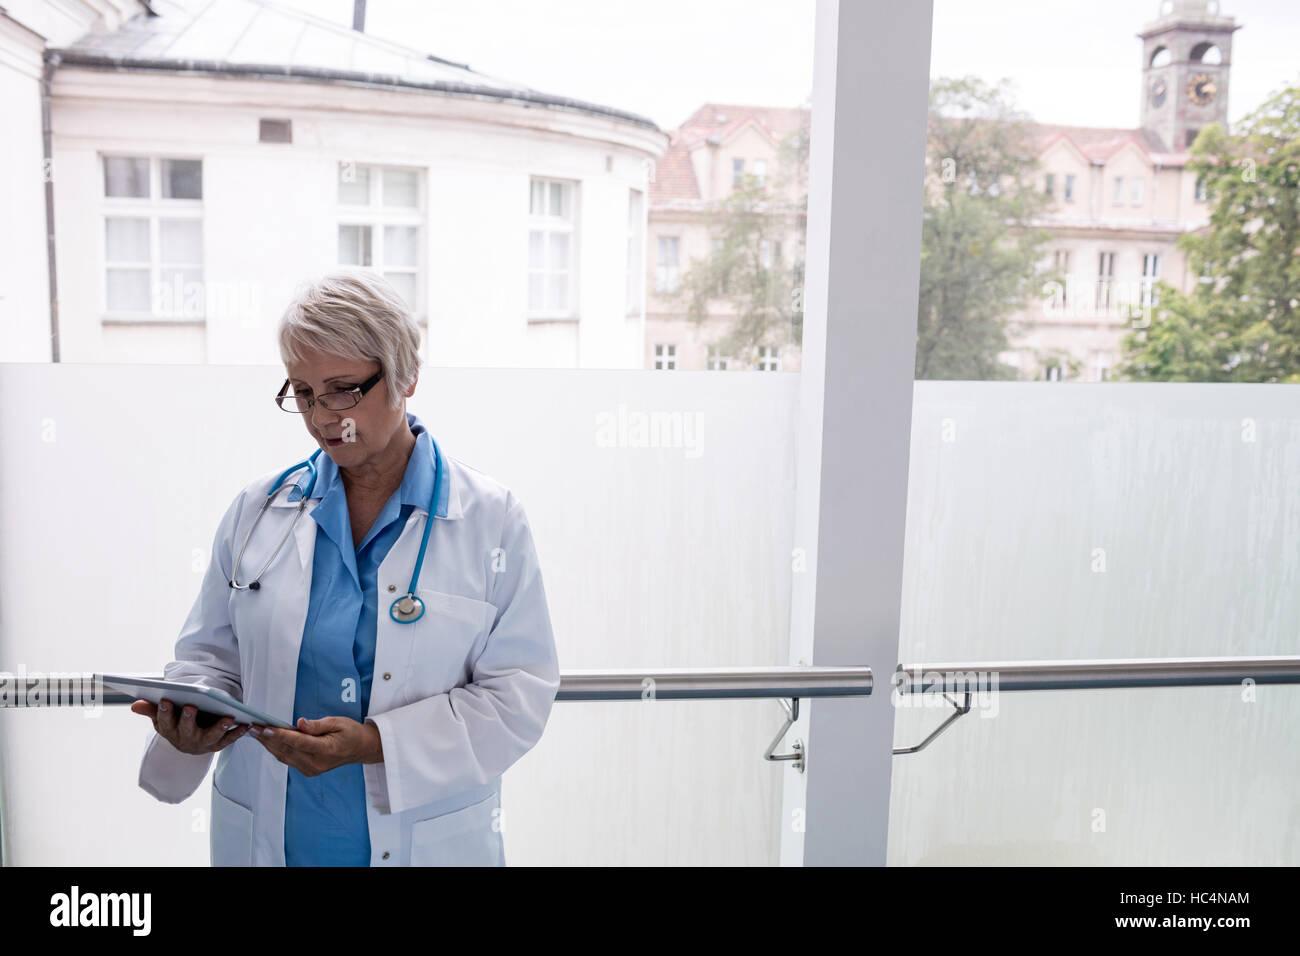 Doctor using digital tablet in corridor Stock Photo